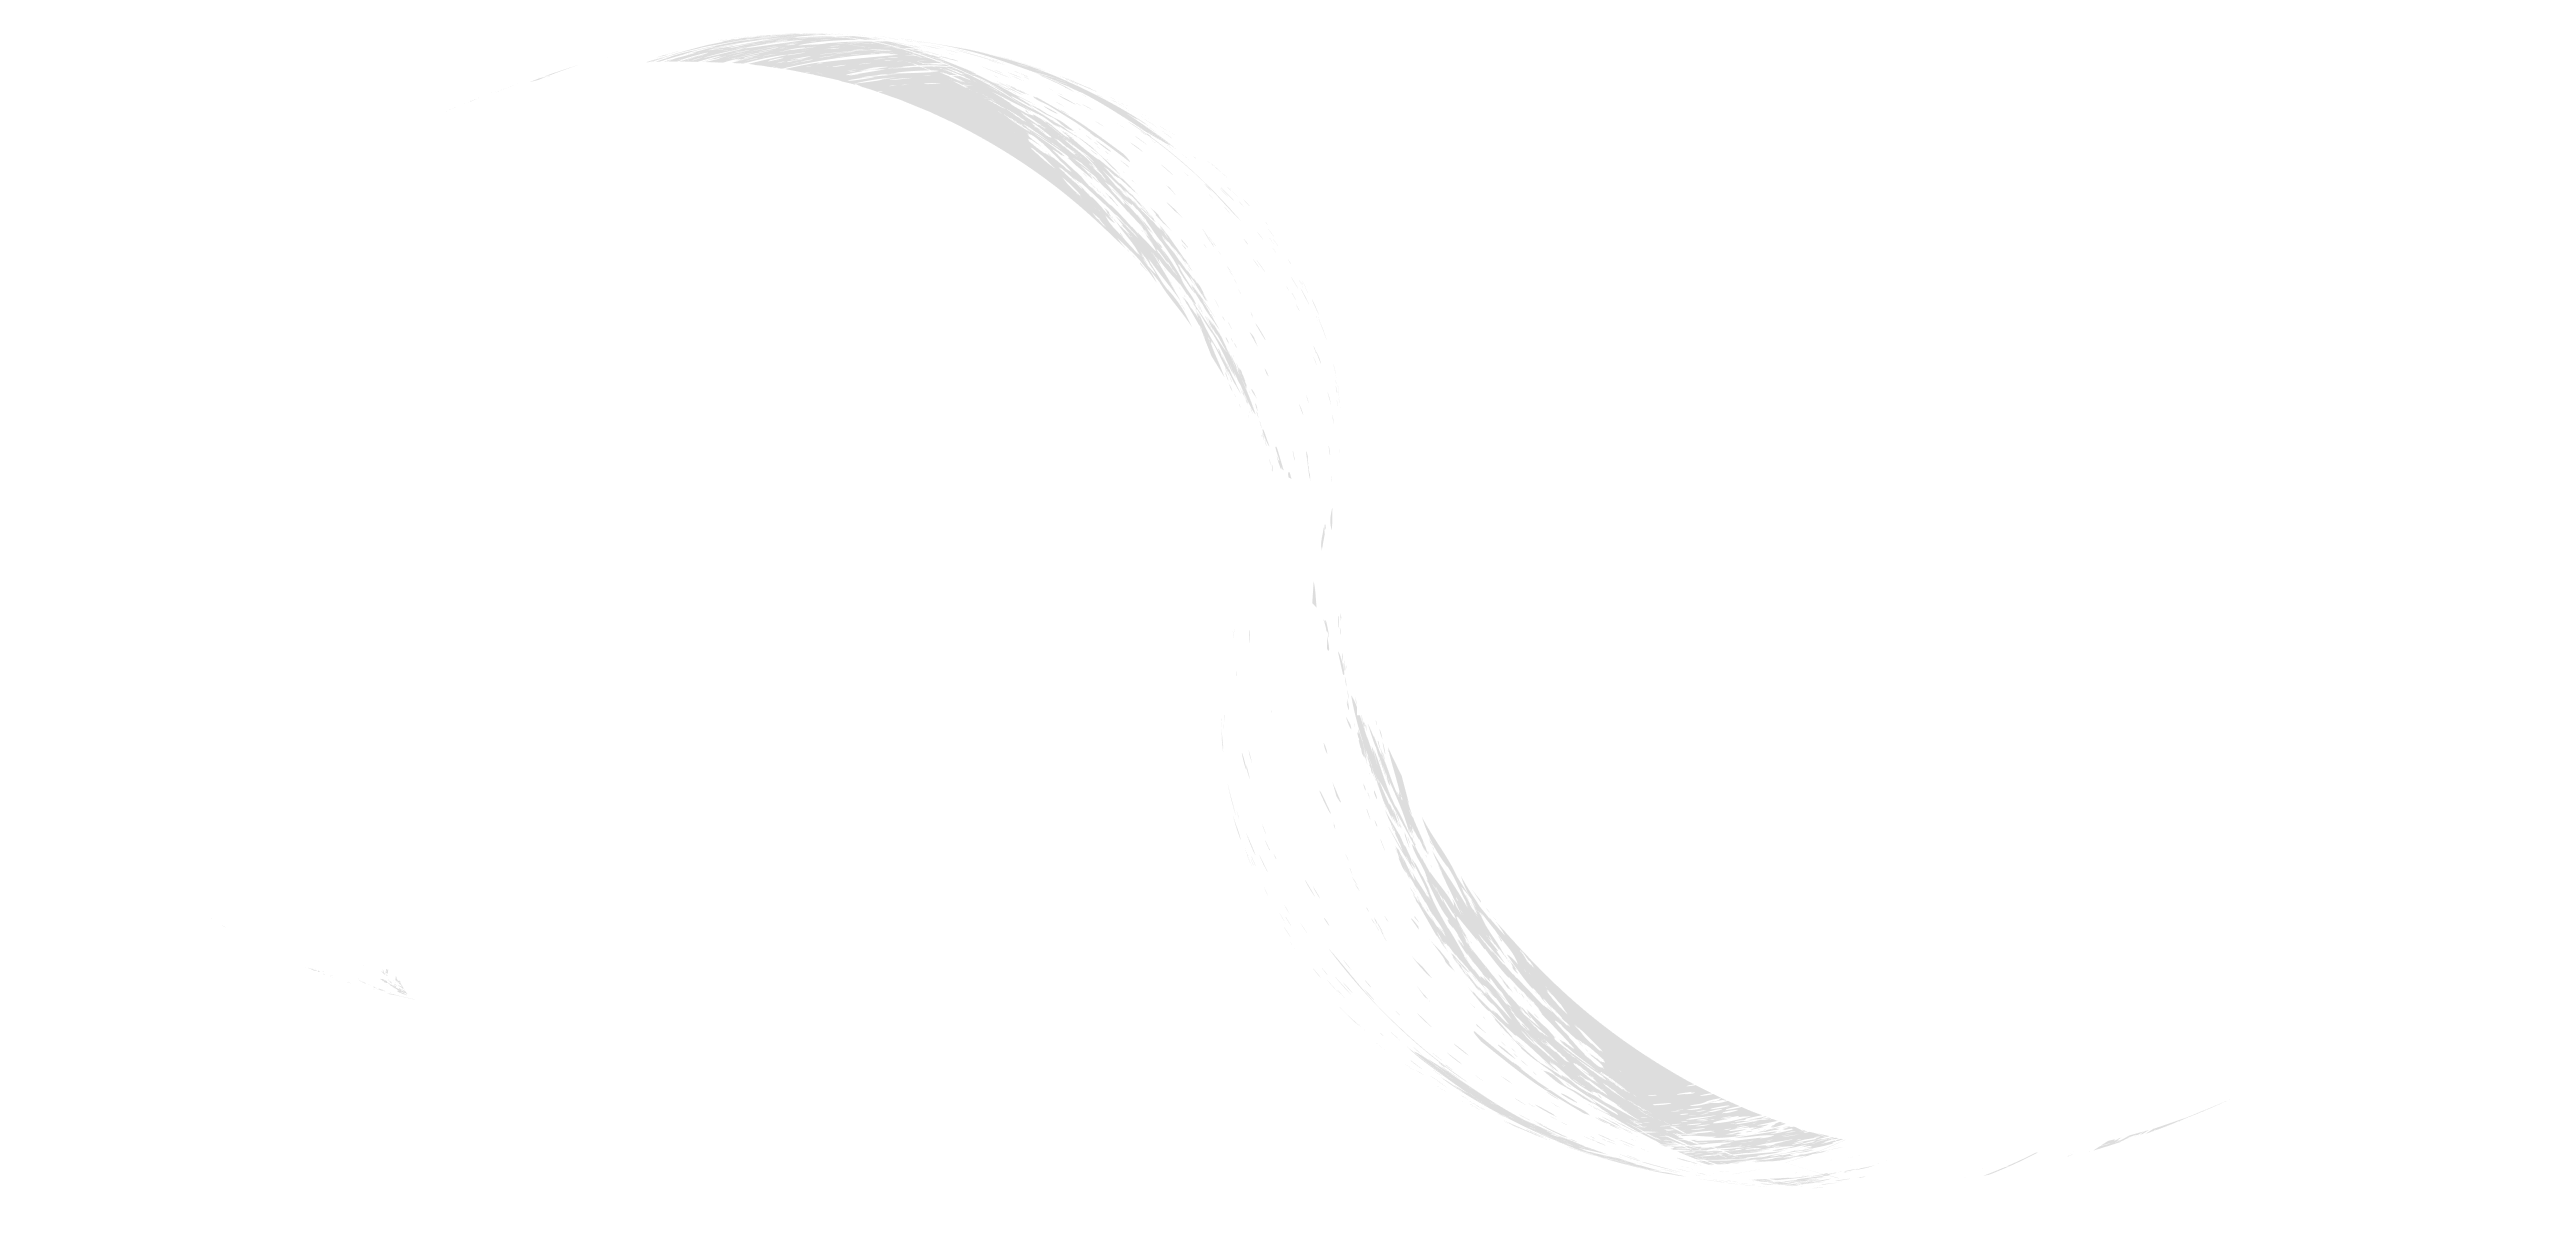 C4EBridge